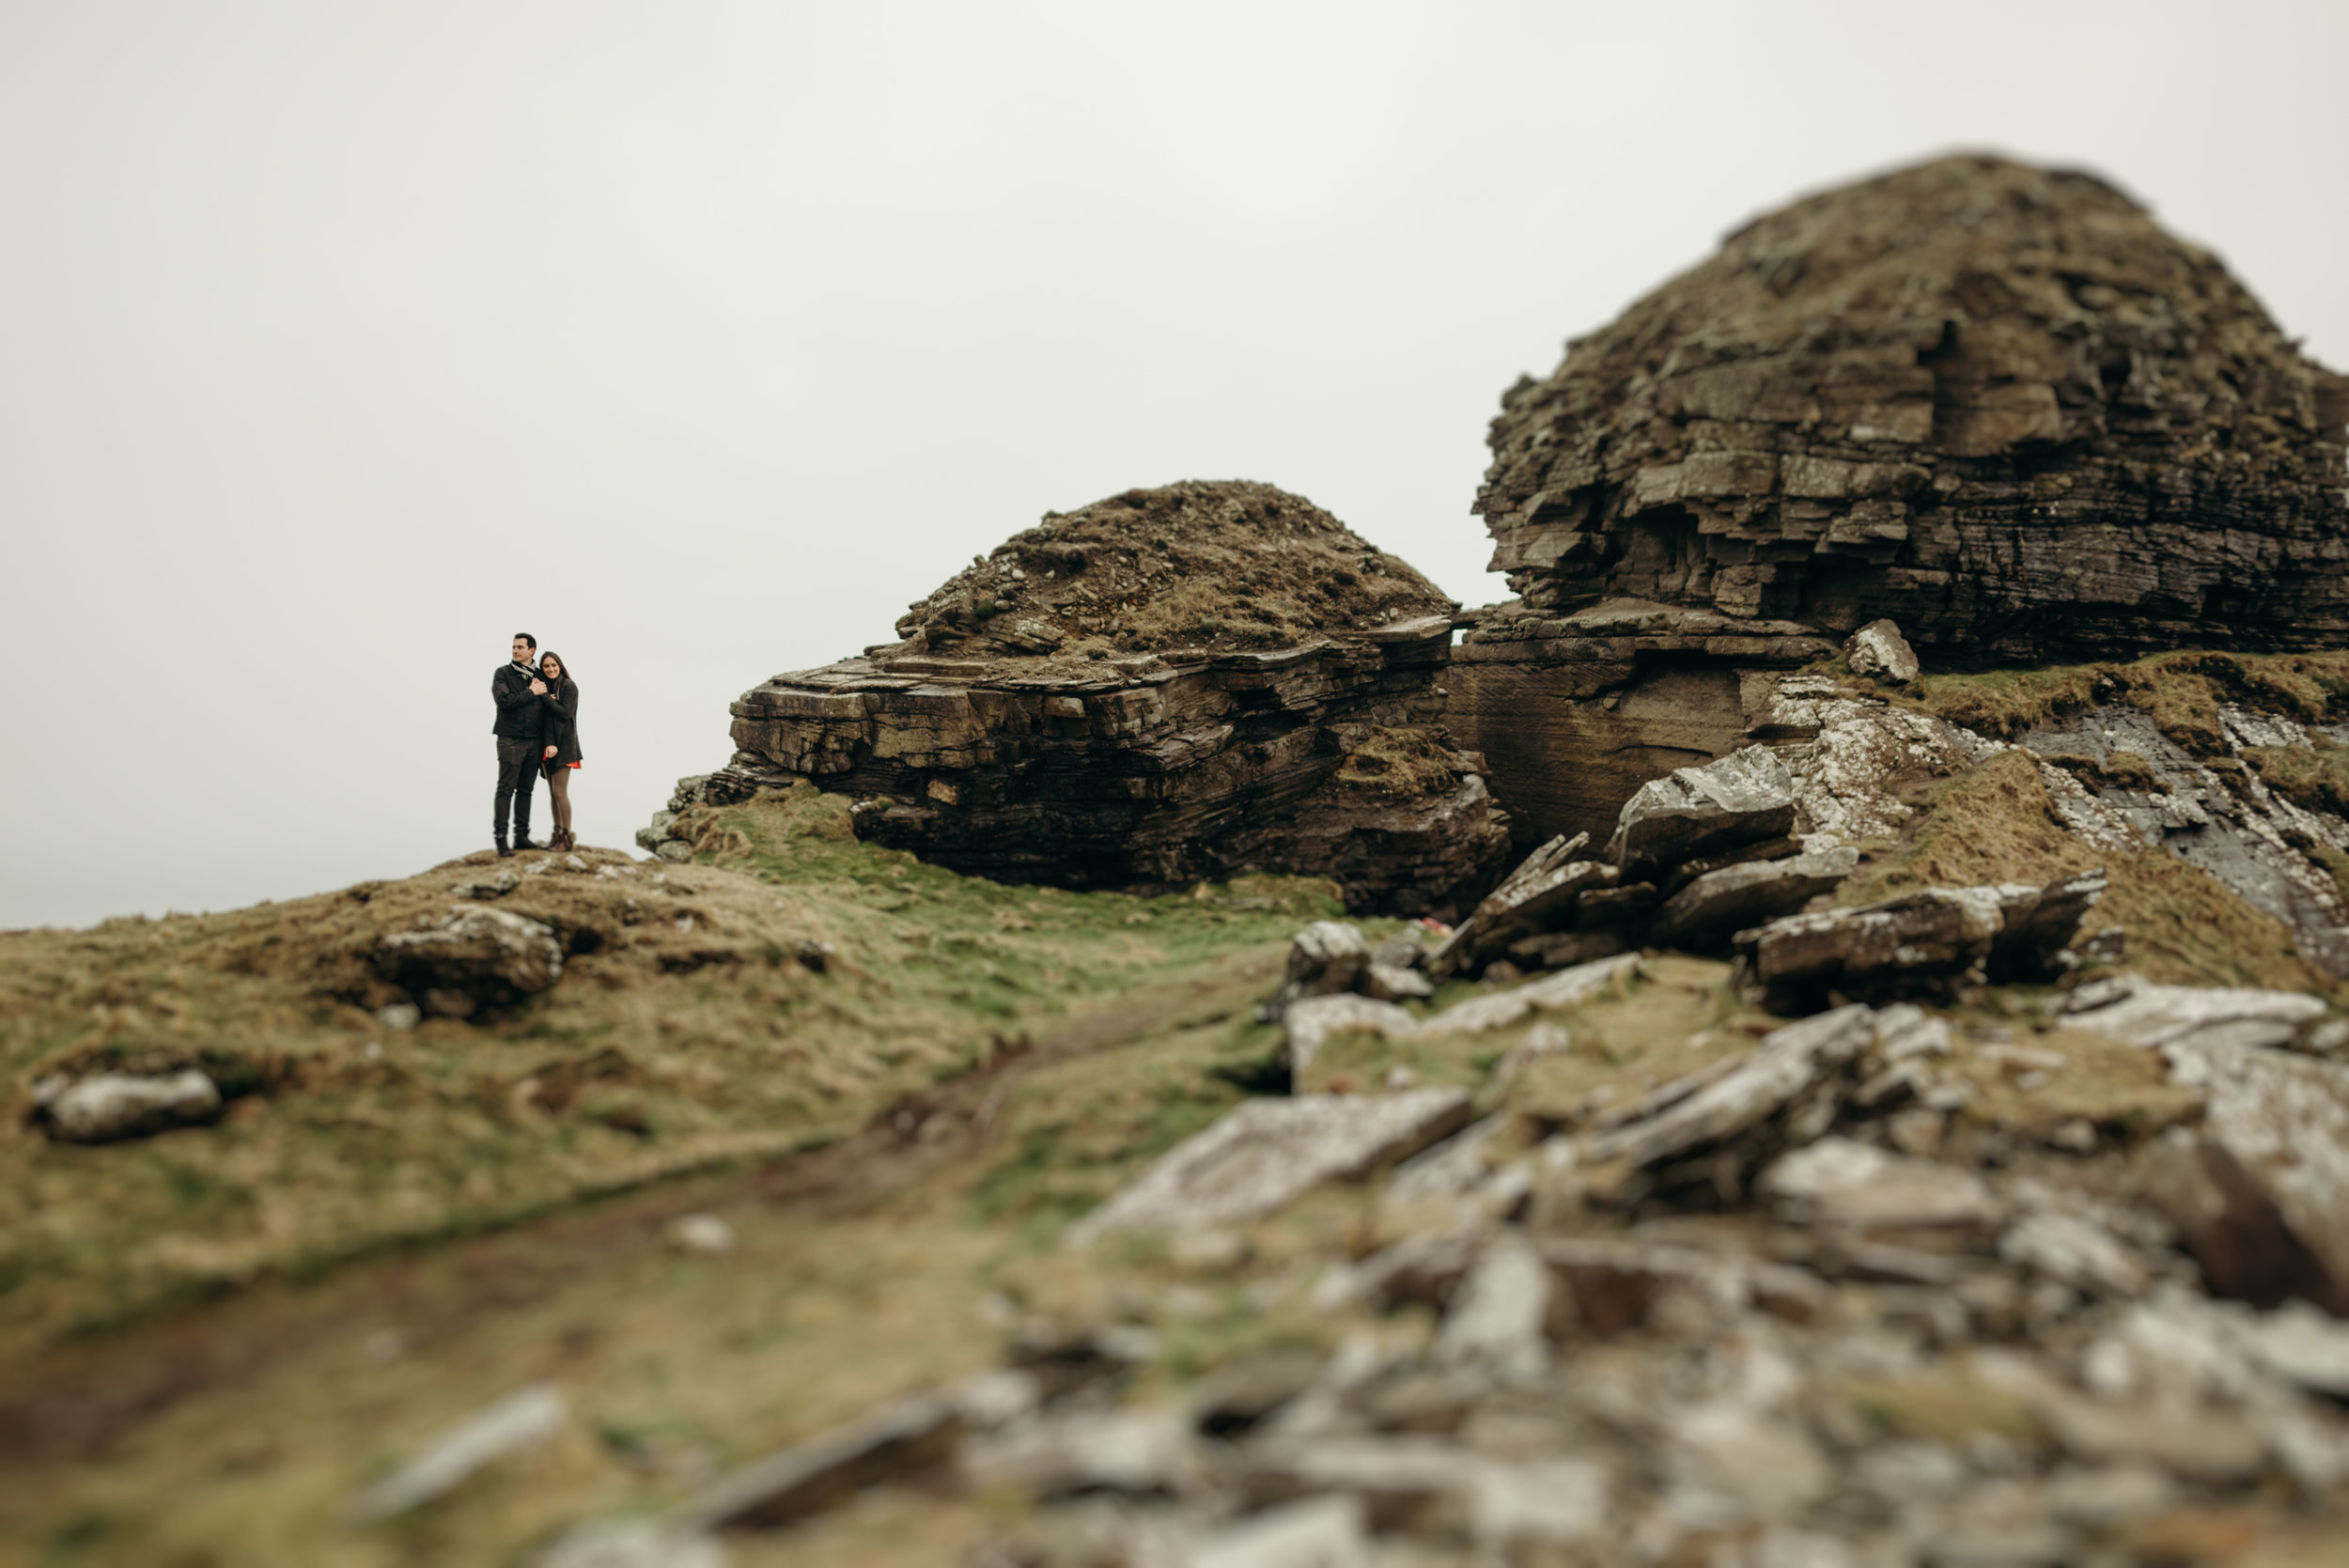 Cliffs Of Moher Engagement Session - Cliffs of Moher Proposal - Cliffs of Mhoer Elopement_6184-Edit-3.jpg